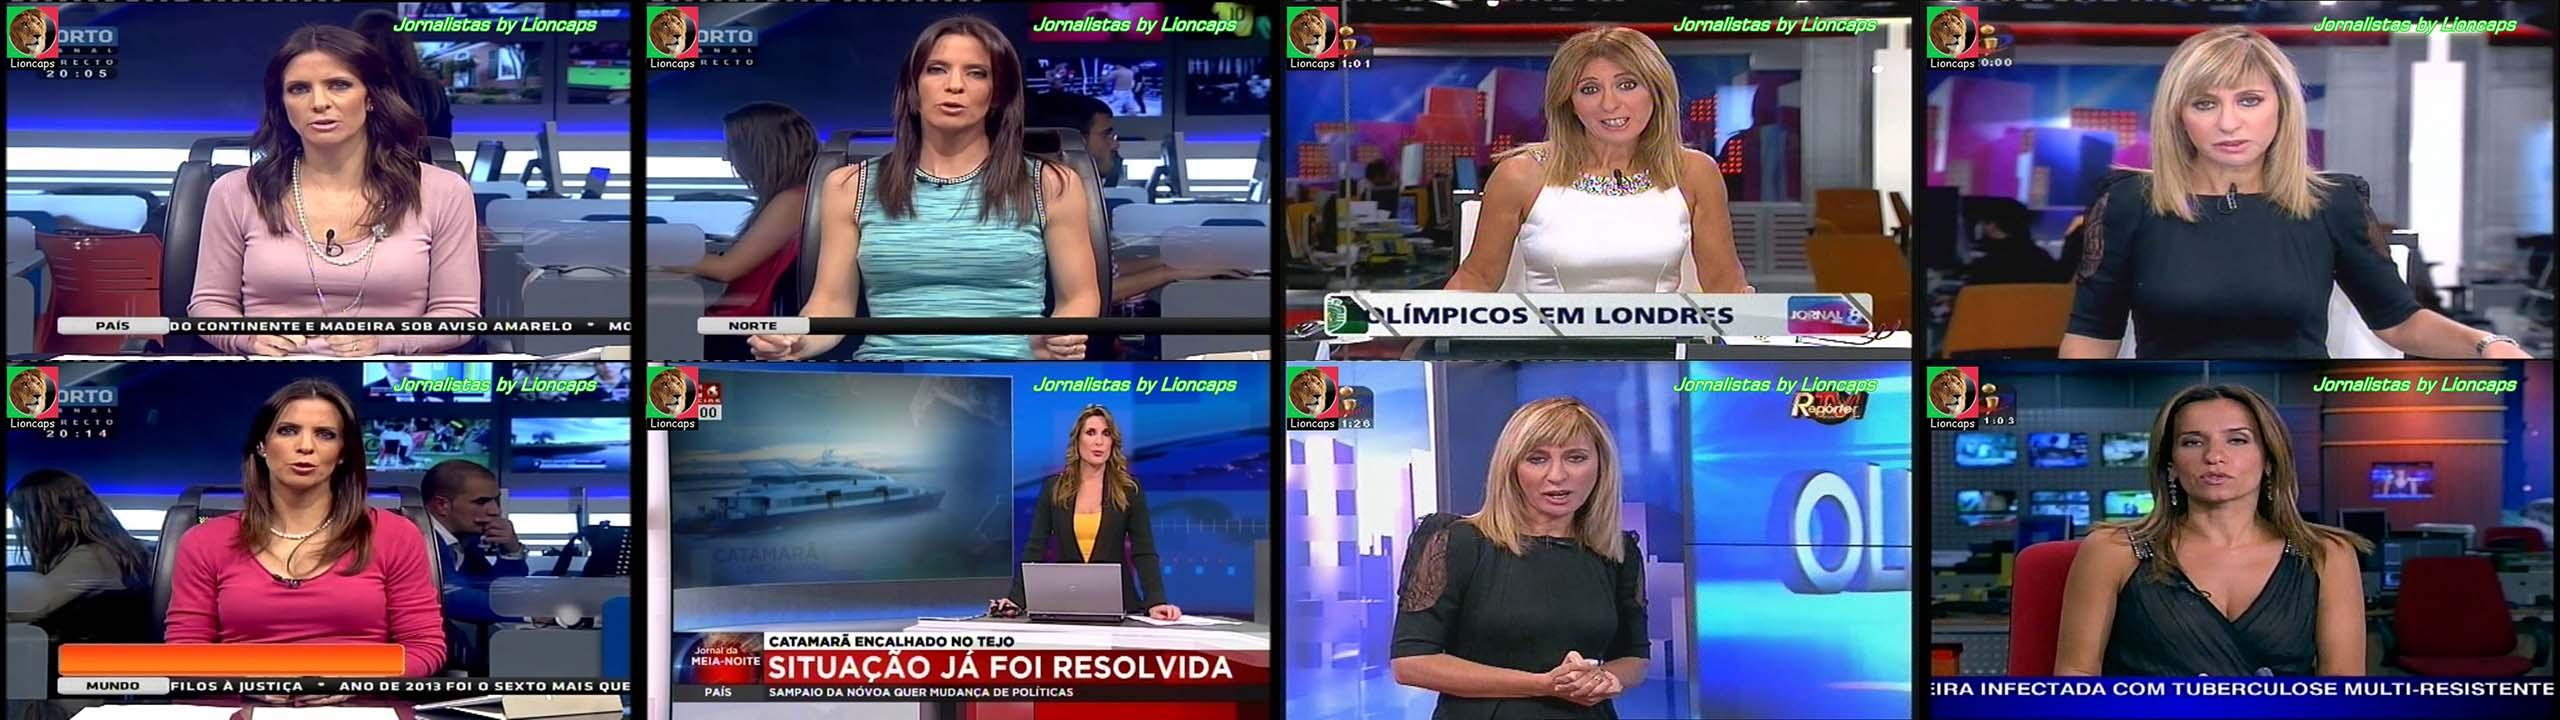 770369587_jornalistas_1080_lioncaps_23_09_2017_12_122_186lo.jpg